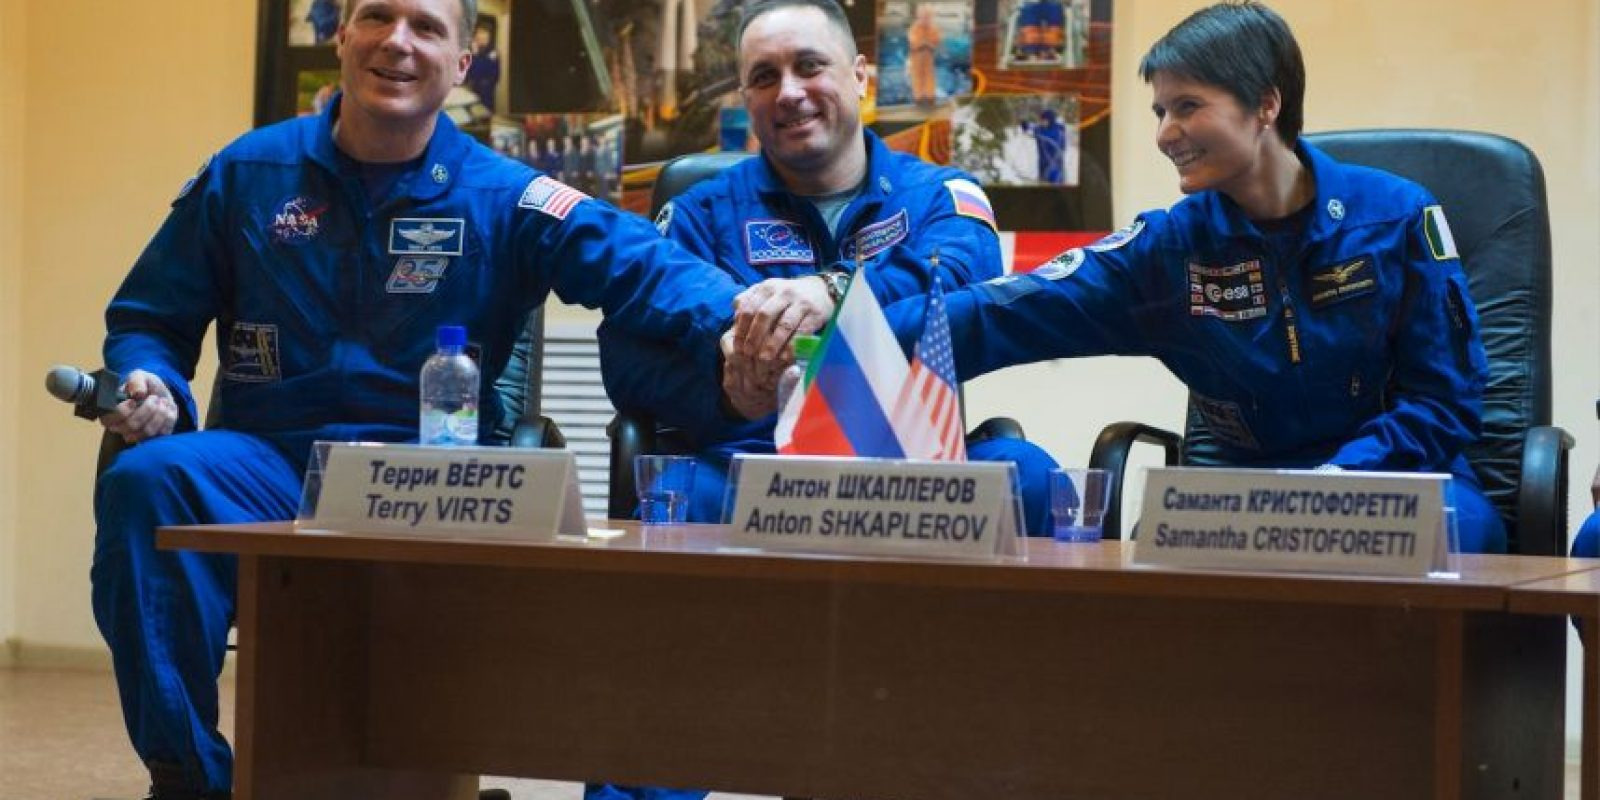 De izquierda a derecha: Terry Virts, Anton Shkaplerov y Samantha Cristoforetti Foto:Getty Images